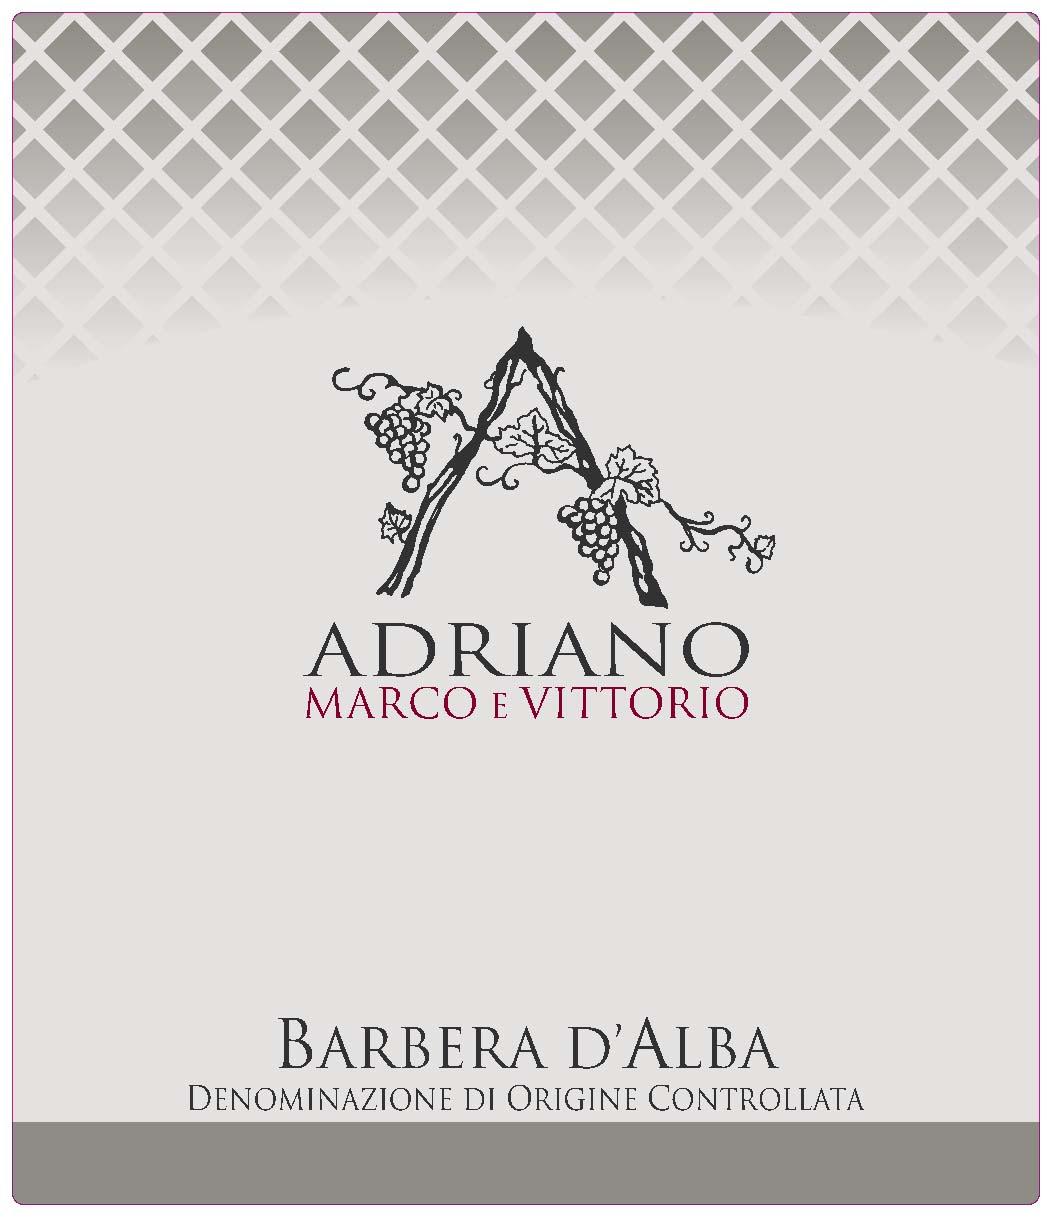 阿维巴贝拉干红Adriano Marco e Vittorio Barbera D'Alba